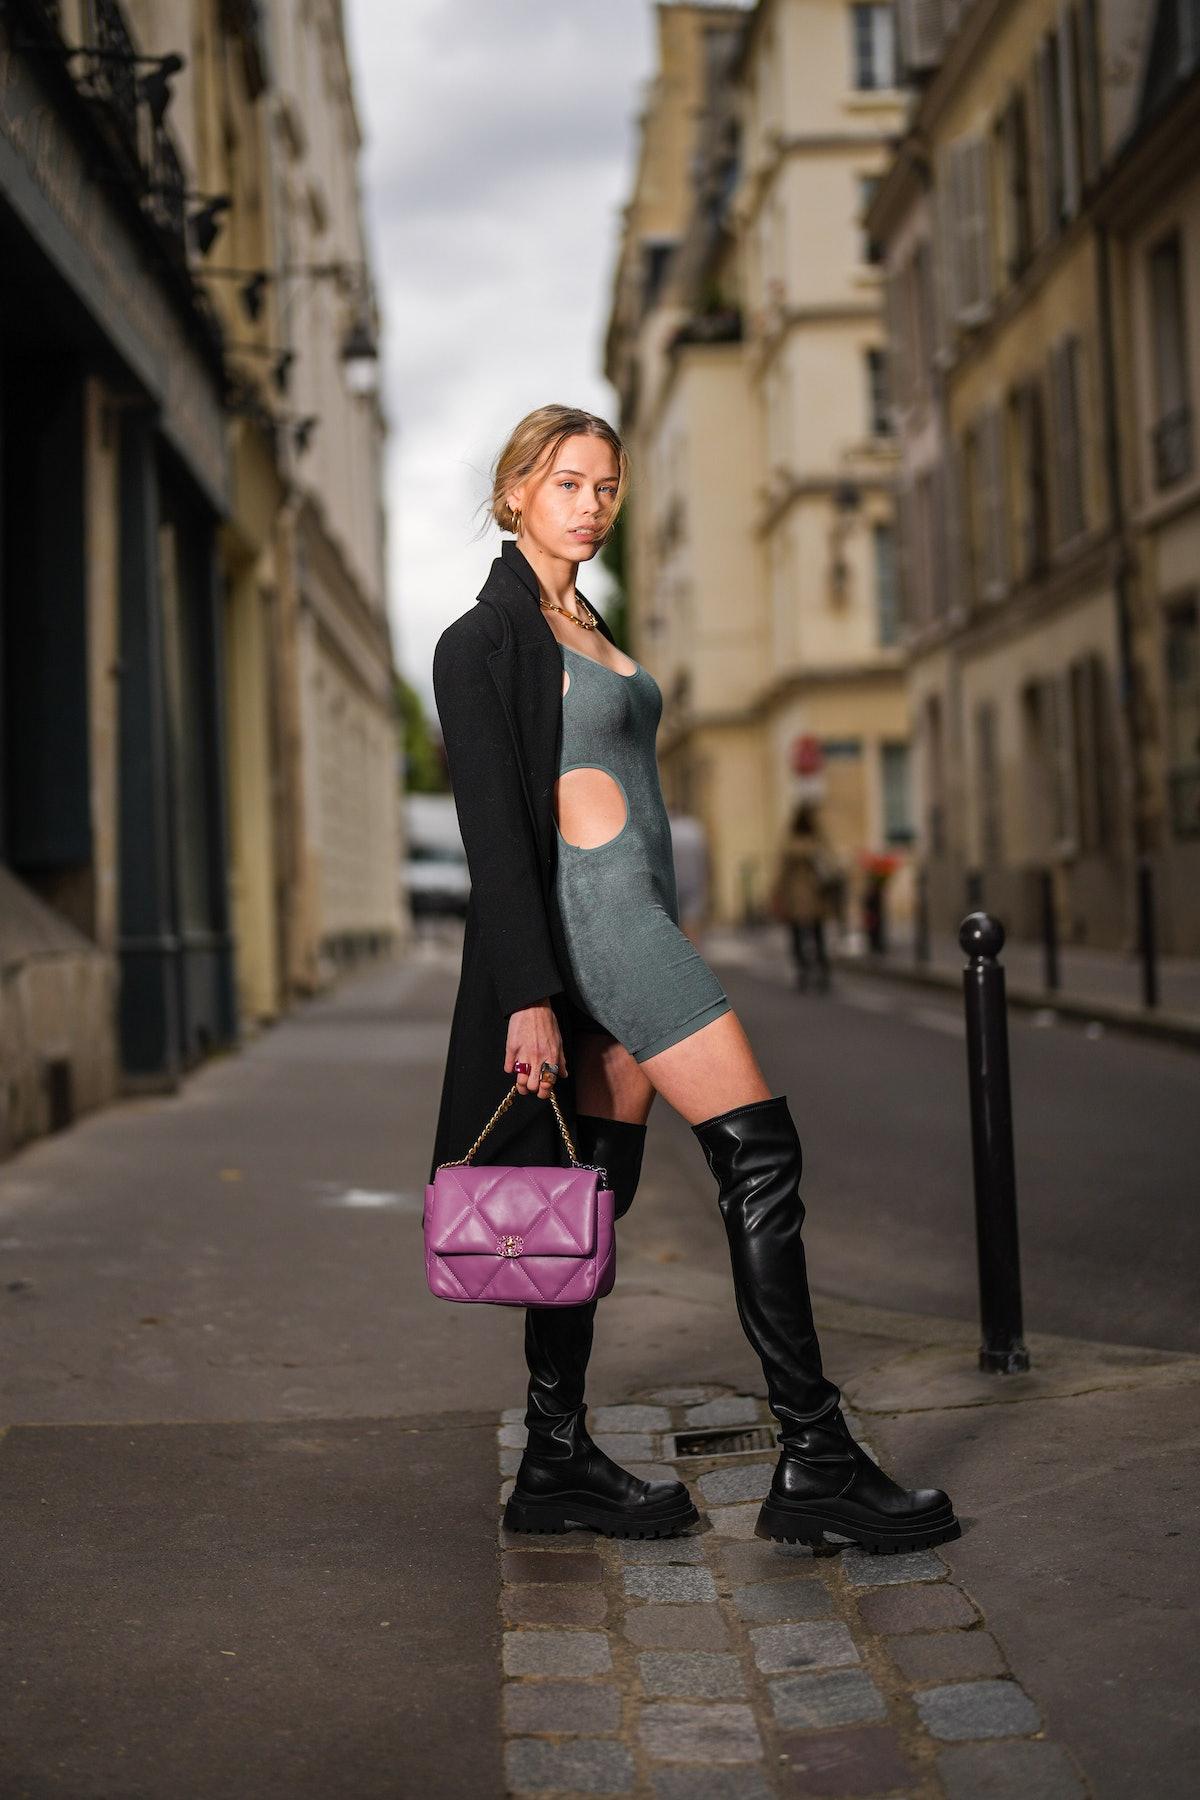 Almuneda Lapique wears gold earrings, a gold chain necklace, a long black Prada coat, a gray Zara sh...